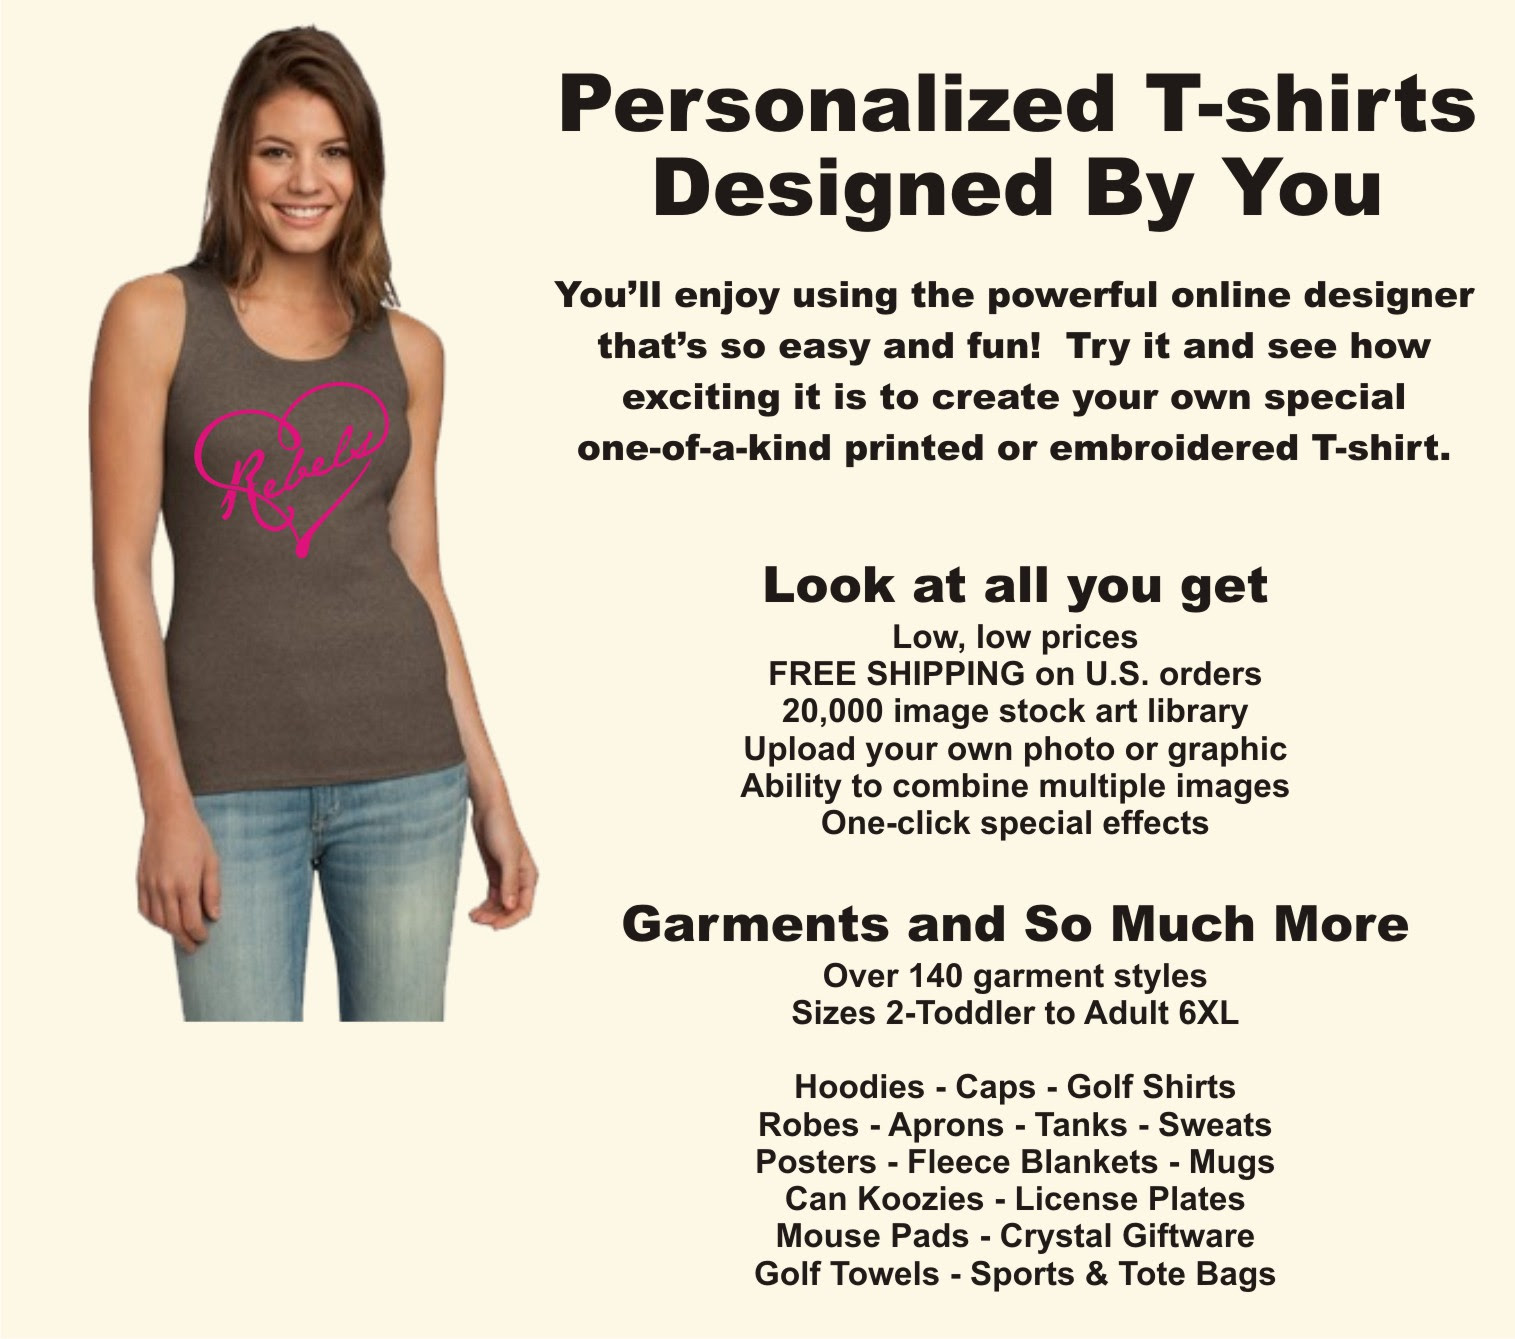 Home Cottonbug Design Your Own T Shirt